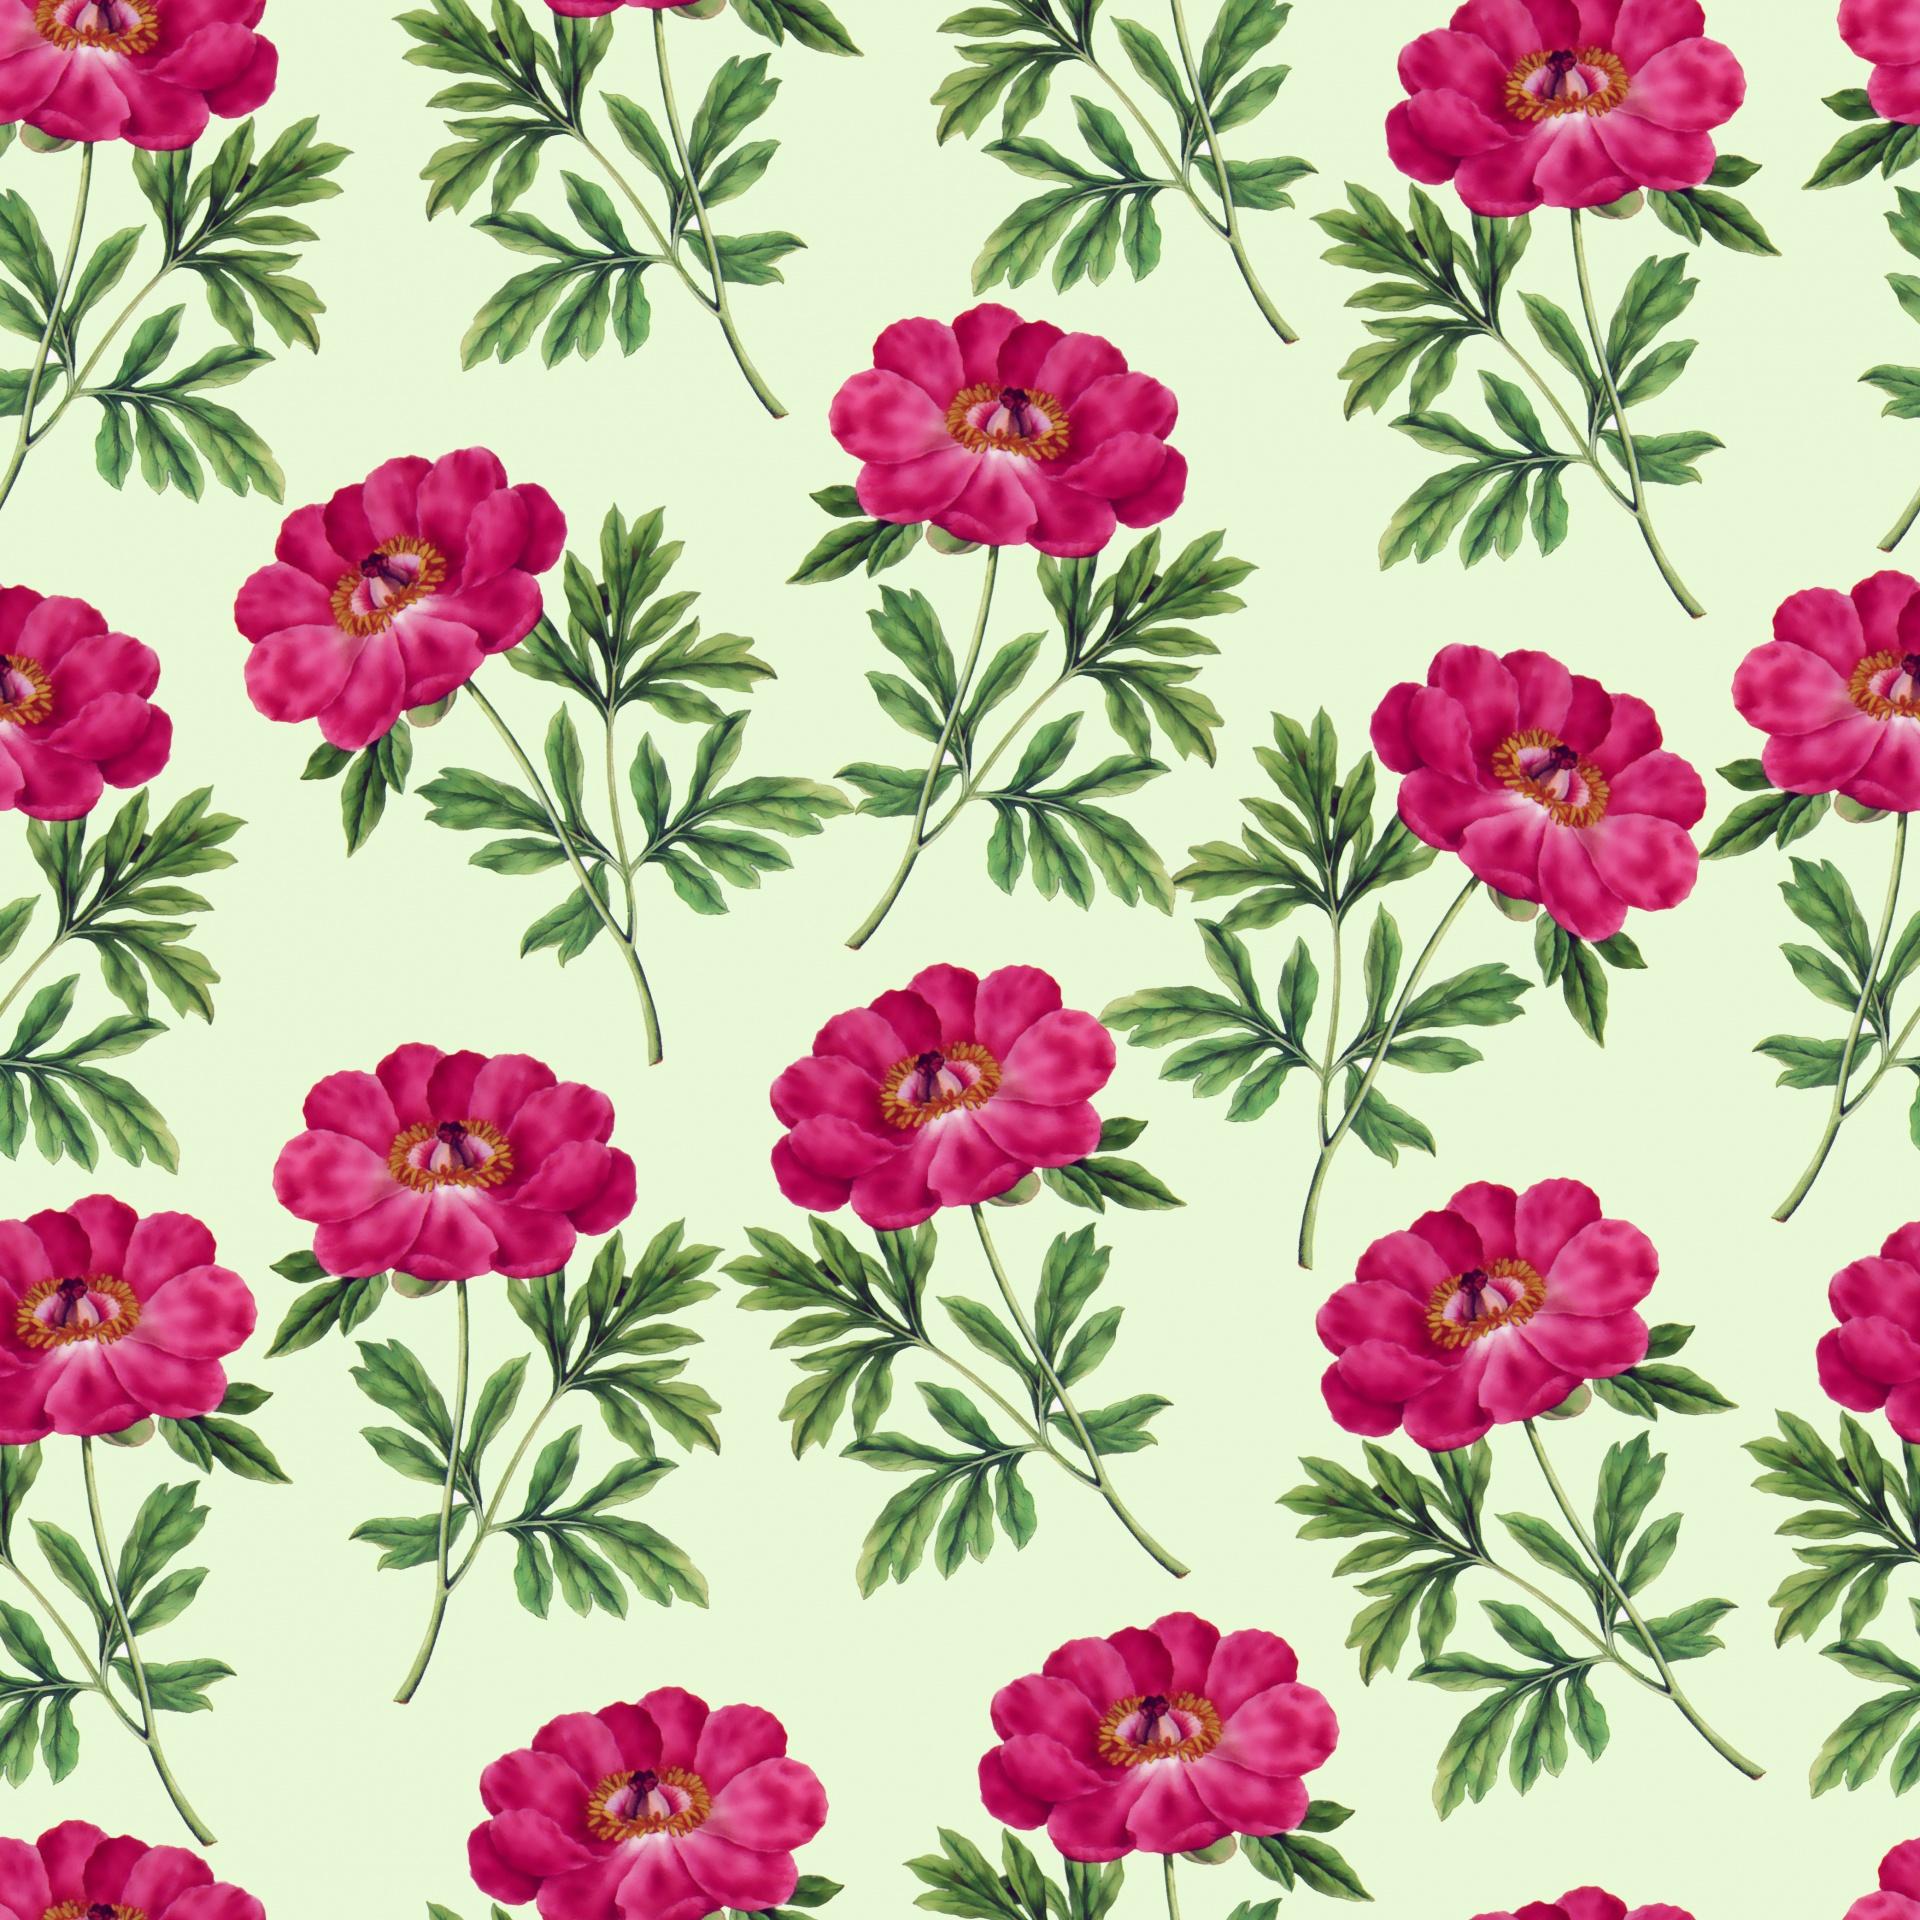 Floral Flowers Botanical Pink Vintage Free Image From Needpix Com